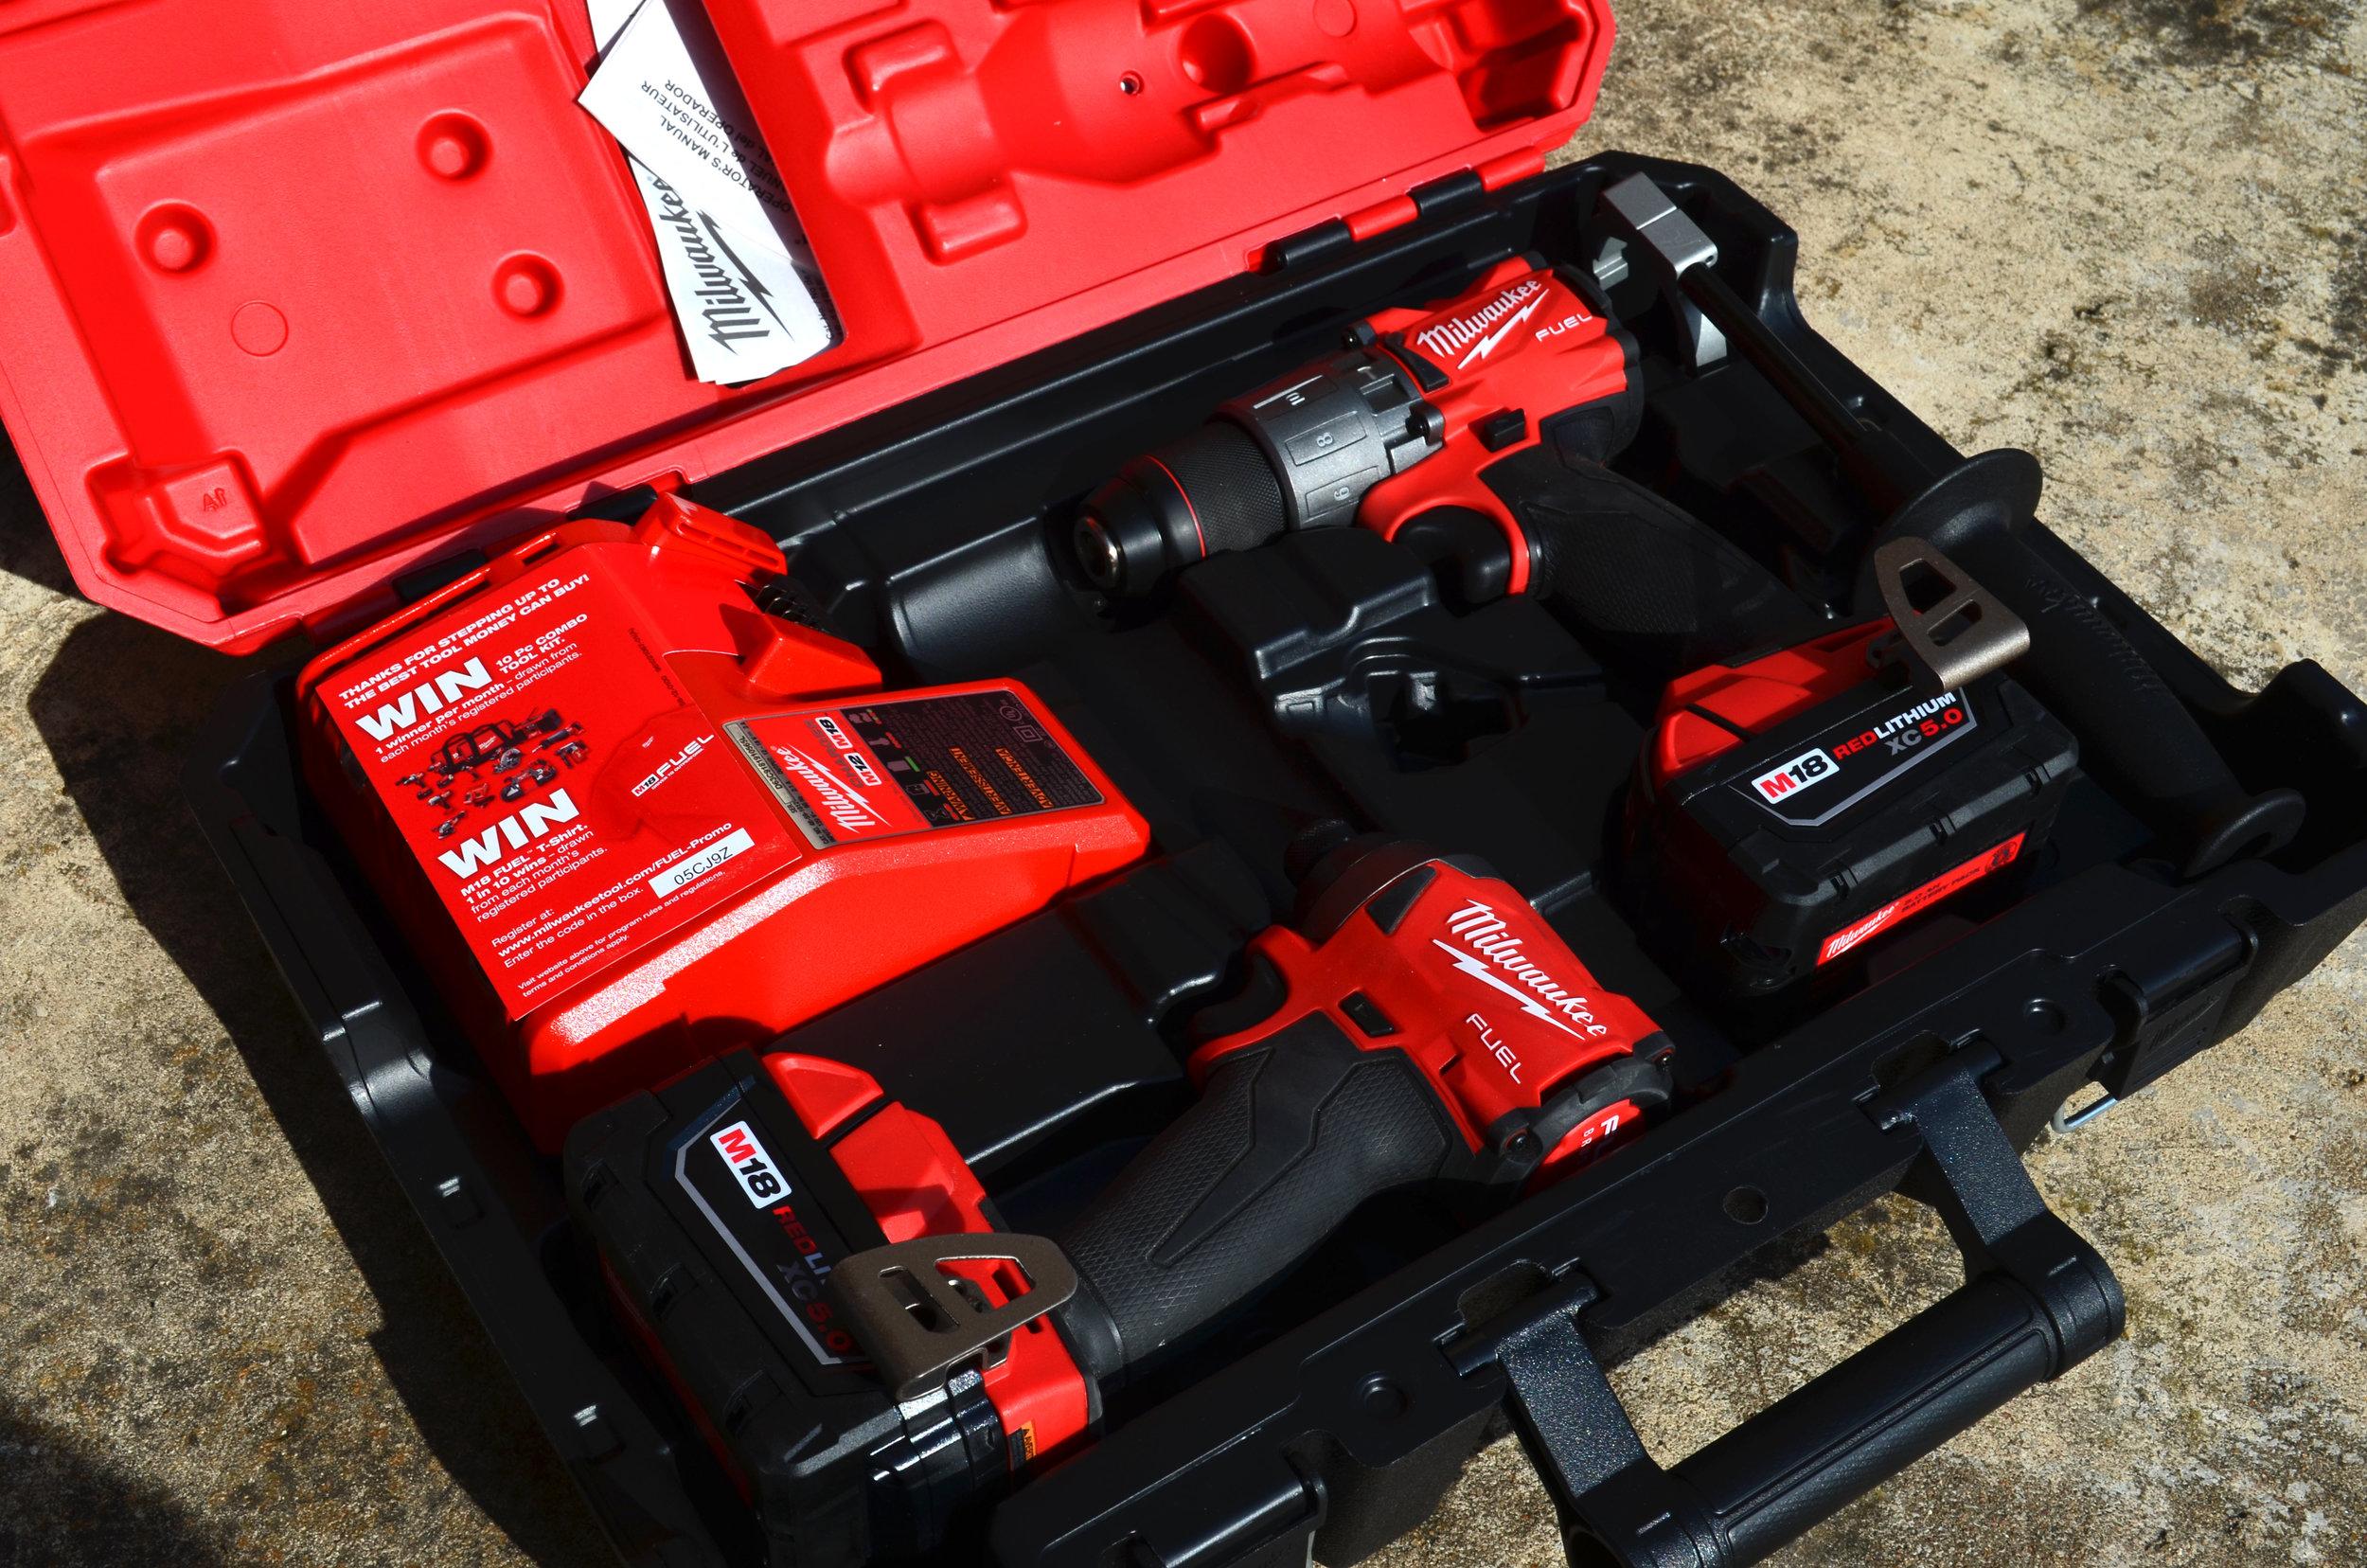 milwaukee-18v-fuel-hammer-drill-impact-driver-combo-kit